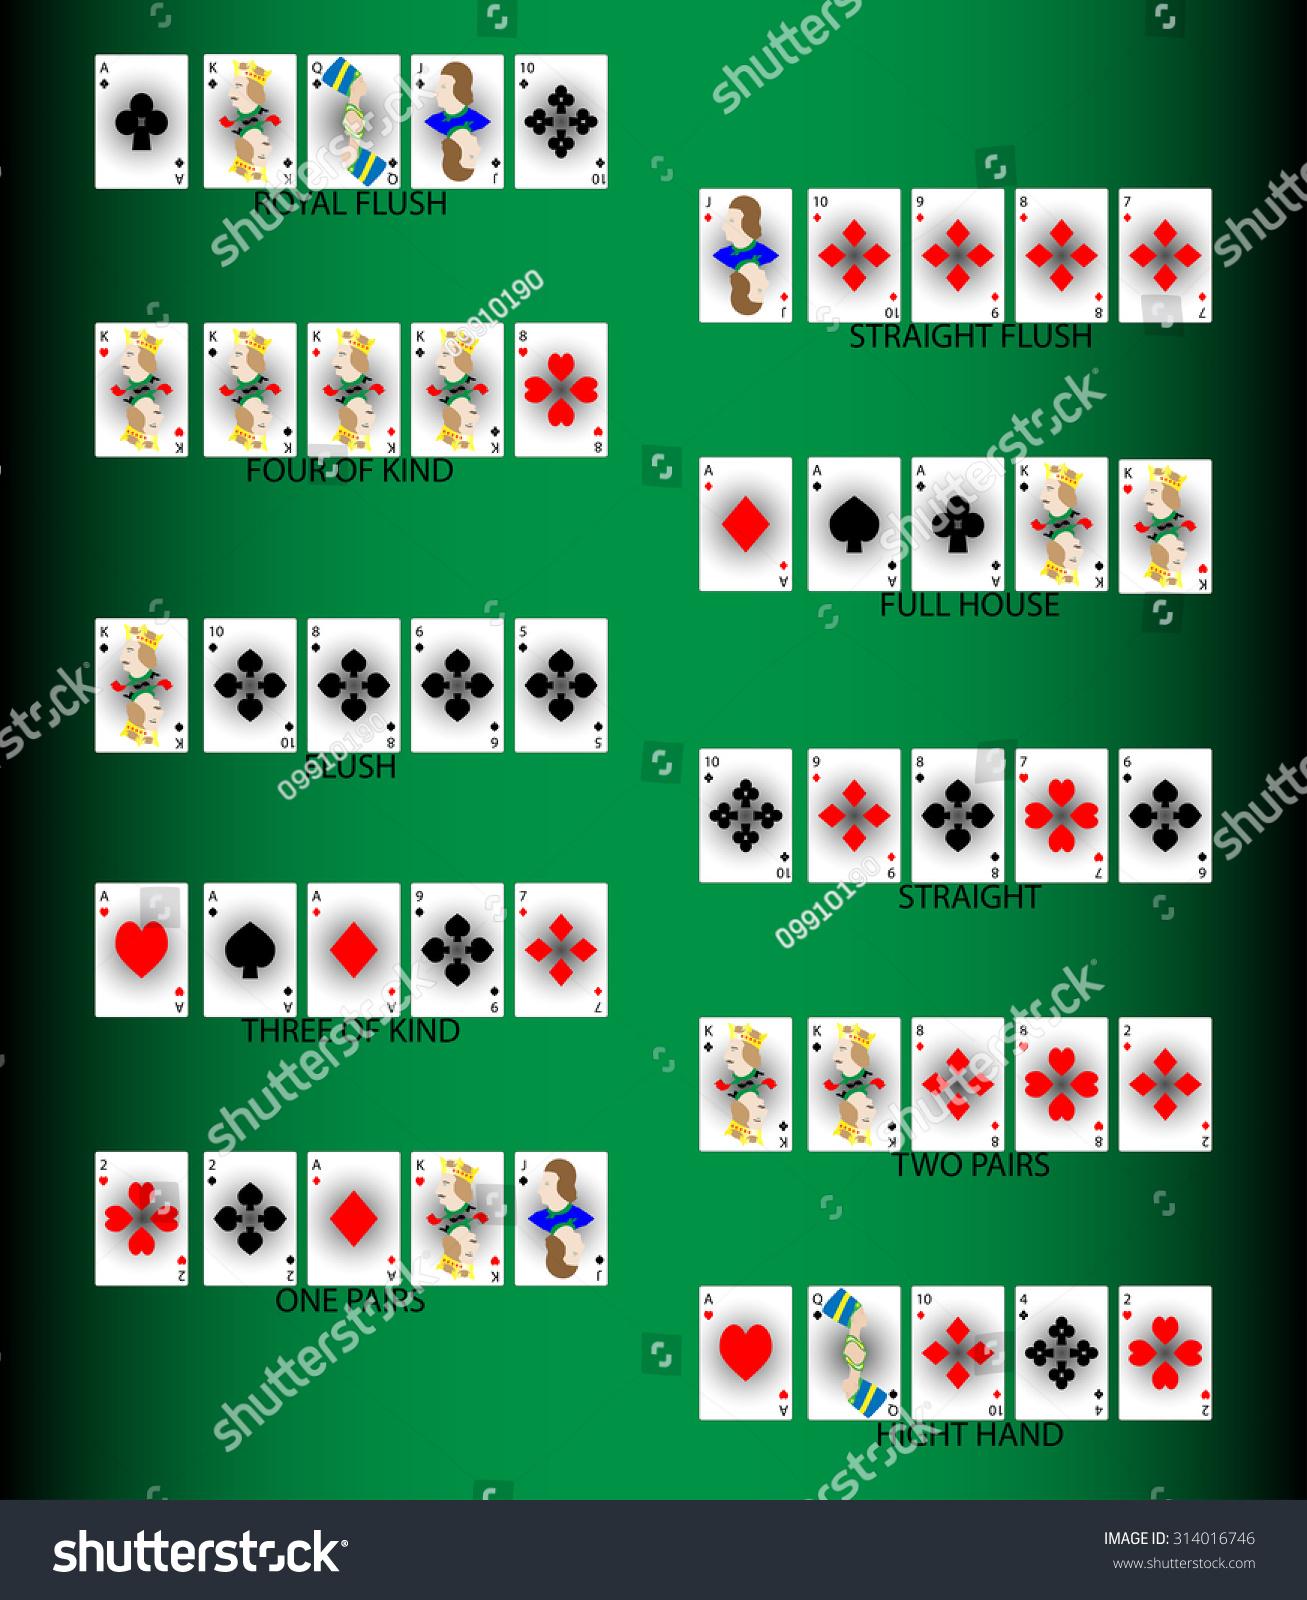 Poker combinations order